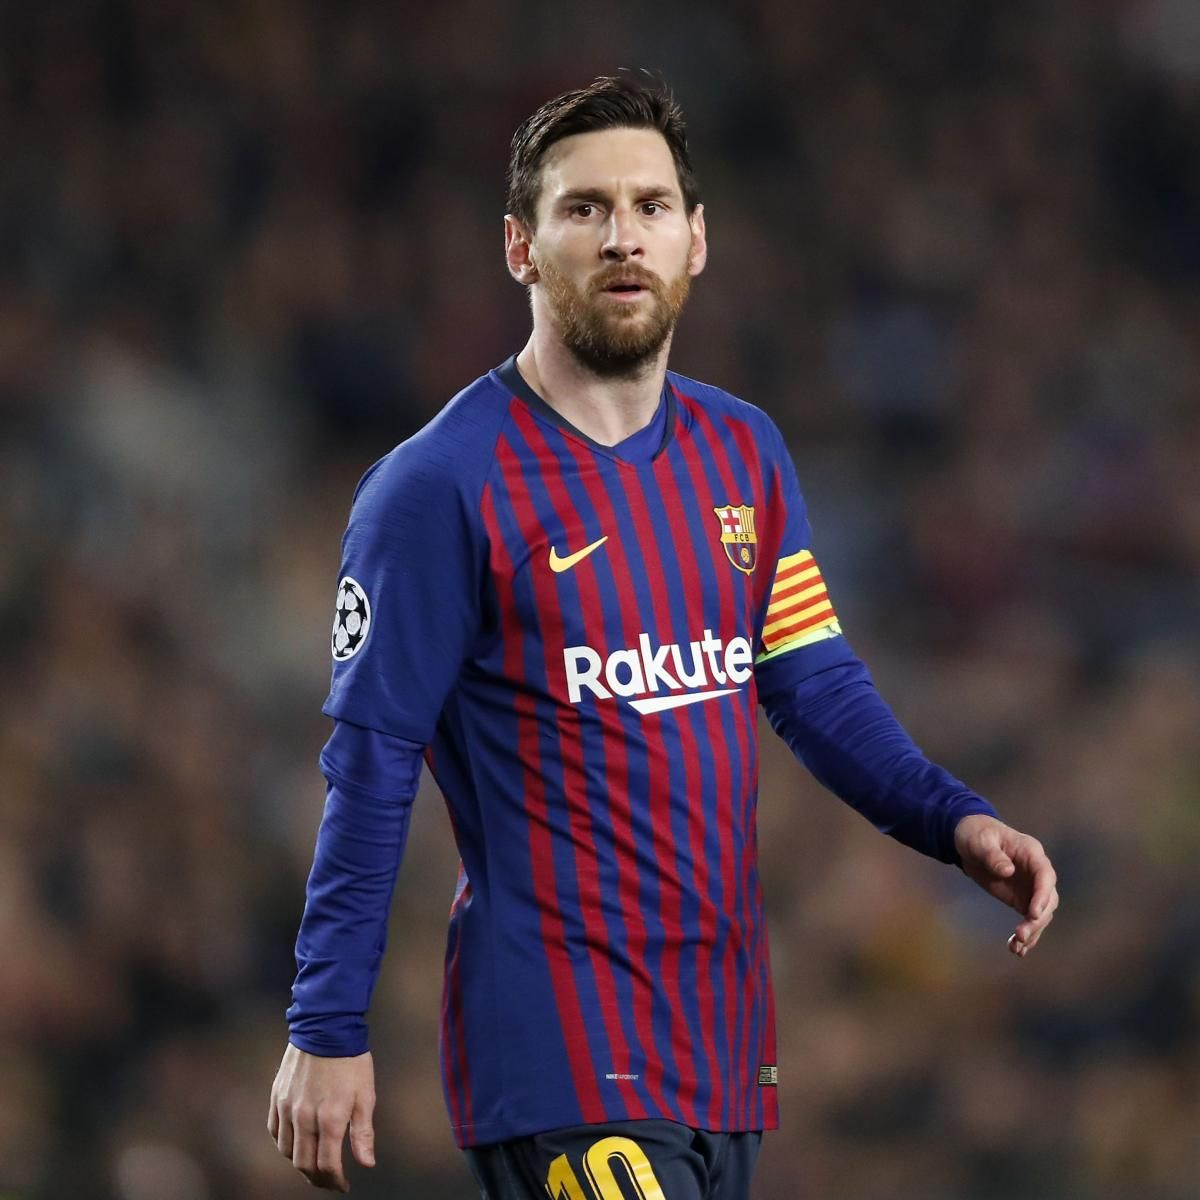 Champions League 2019 SemiFinal Leg 1 Odds, Live Stream